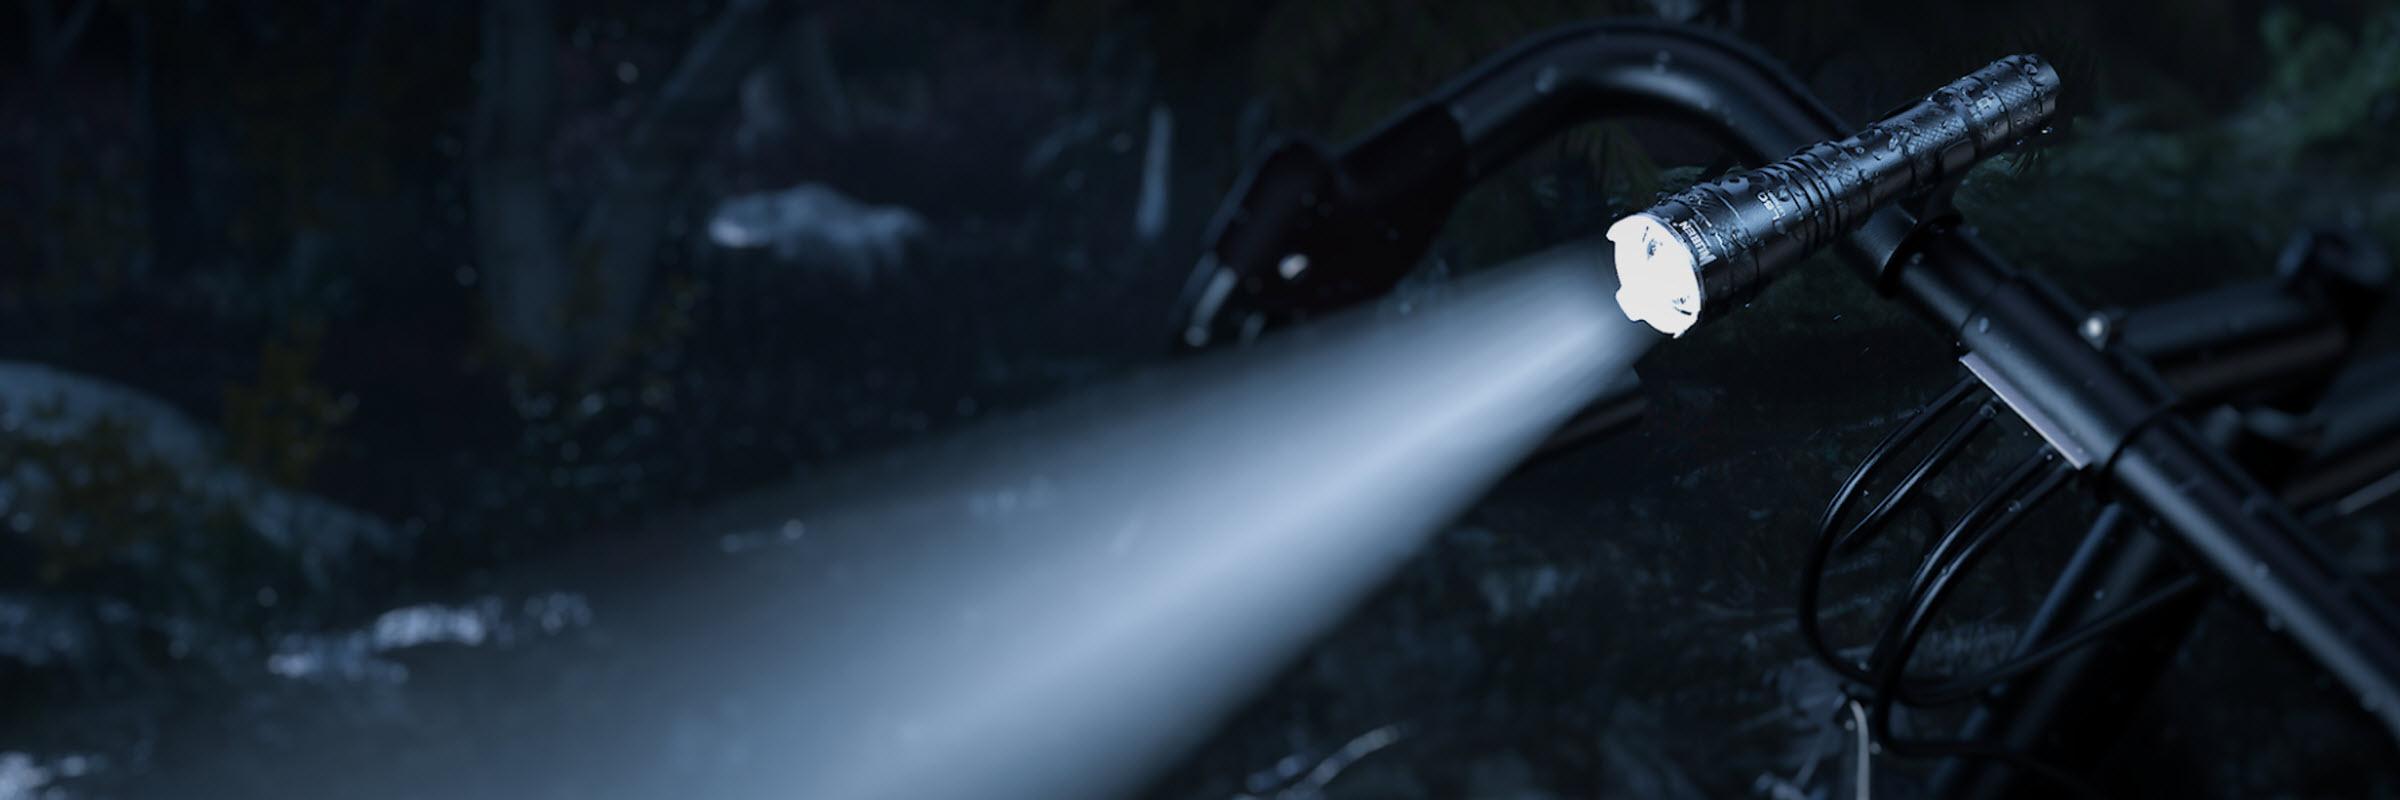 Wuben LED Taschenlampen